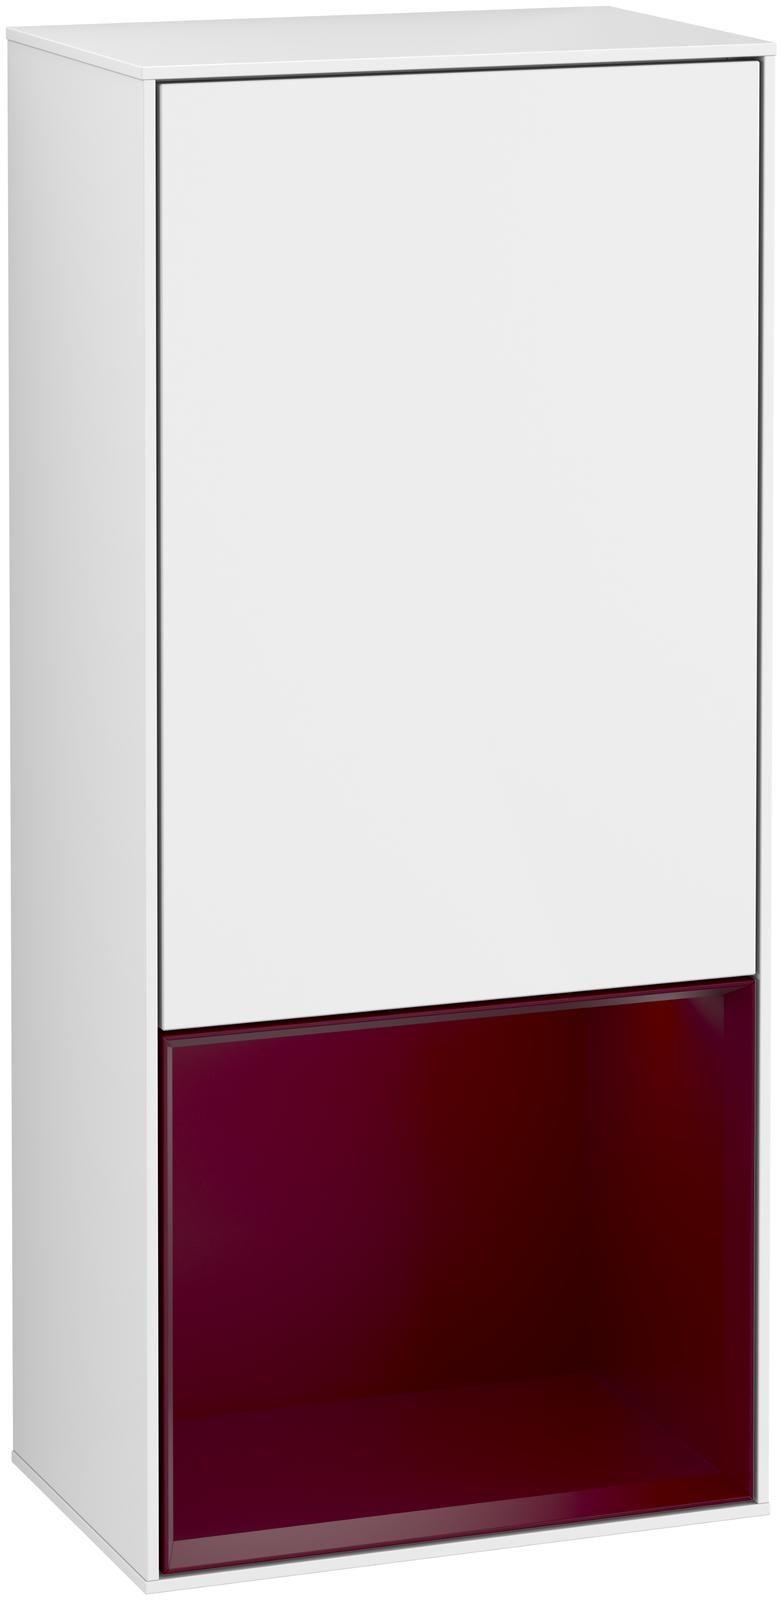 Villeroy & Boch Finion F54 Seitenschrank mit Regalelement 1 Tür Anschlag links LED-Beleuchtung B:41,8xH:93,6xT:27cm Front, Korpus: Glossy White Lack, Regal: Peony F540HBGF